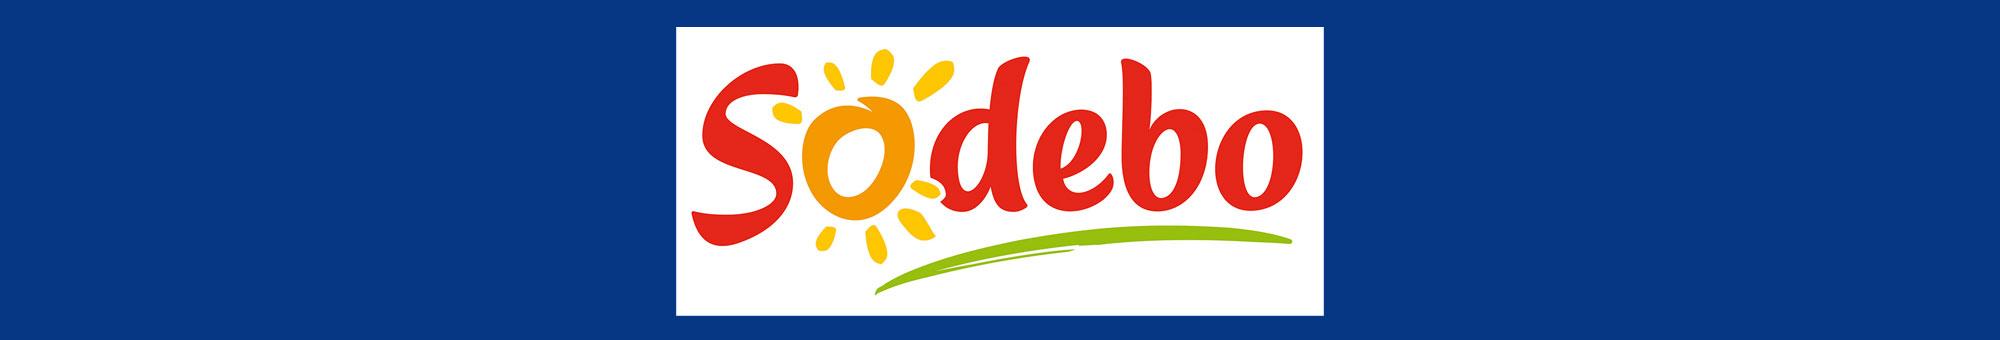 Logo de Sodebo